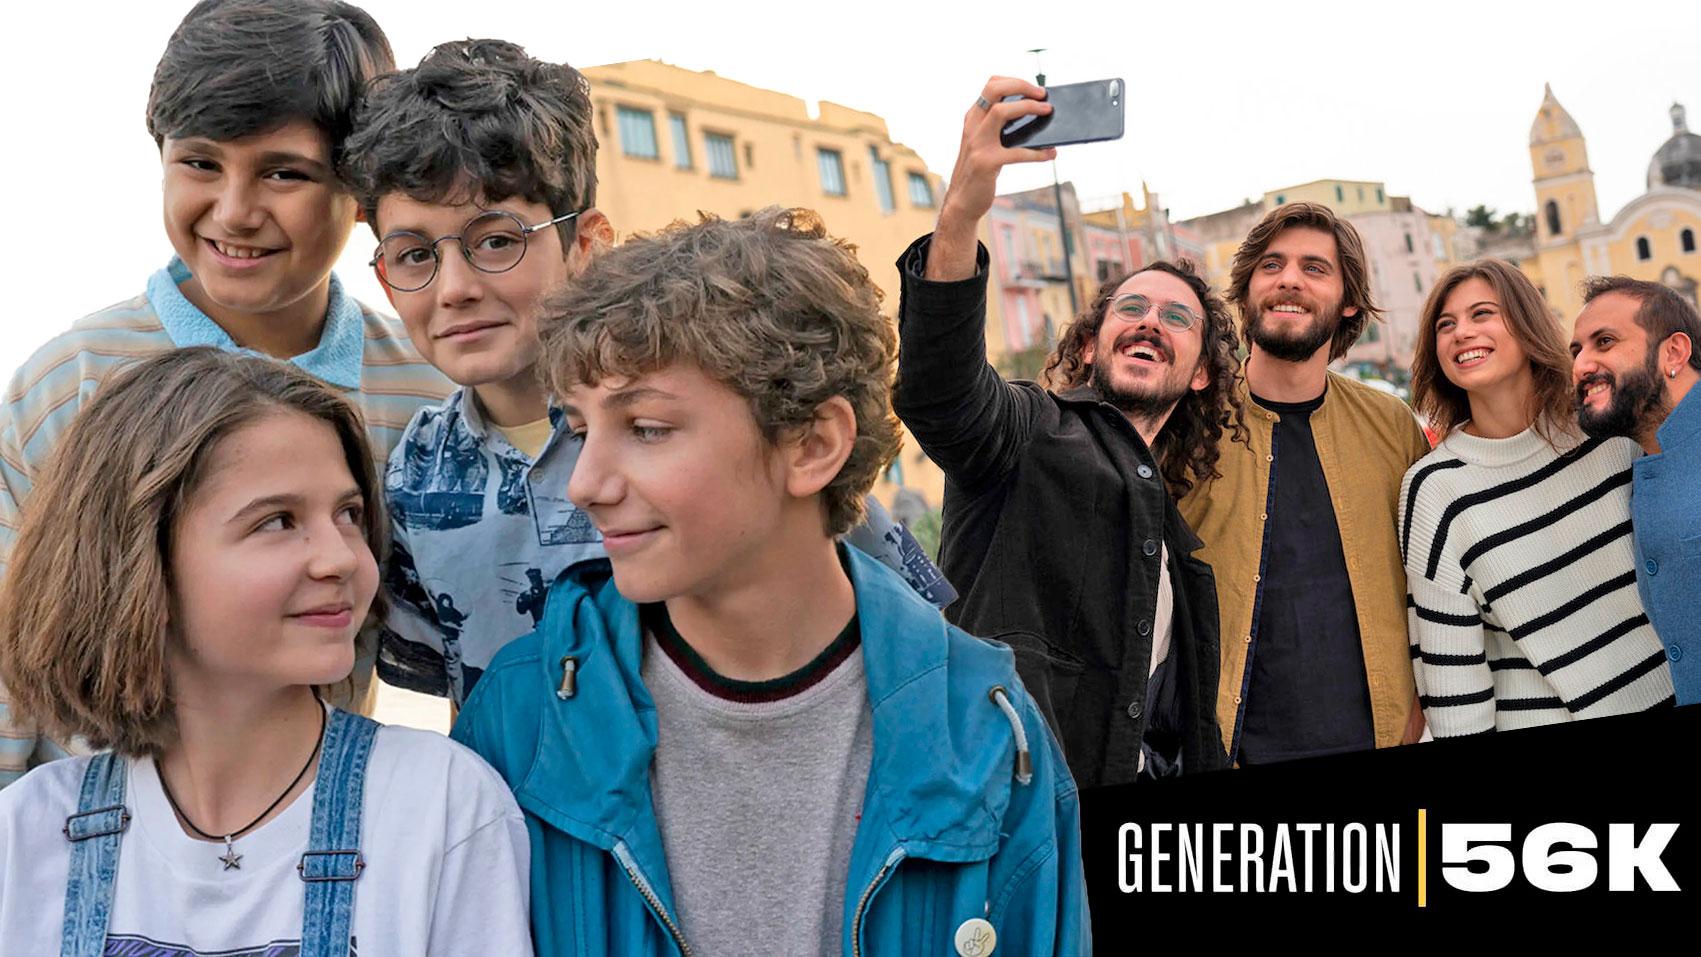 generacion-56k